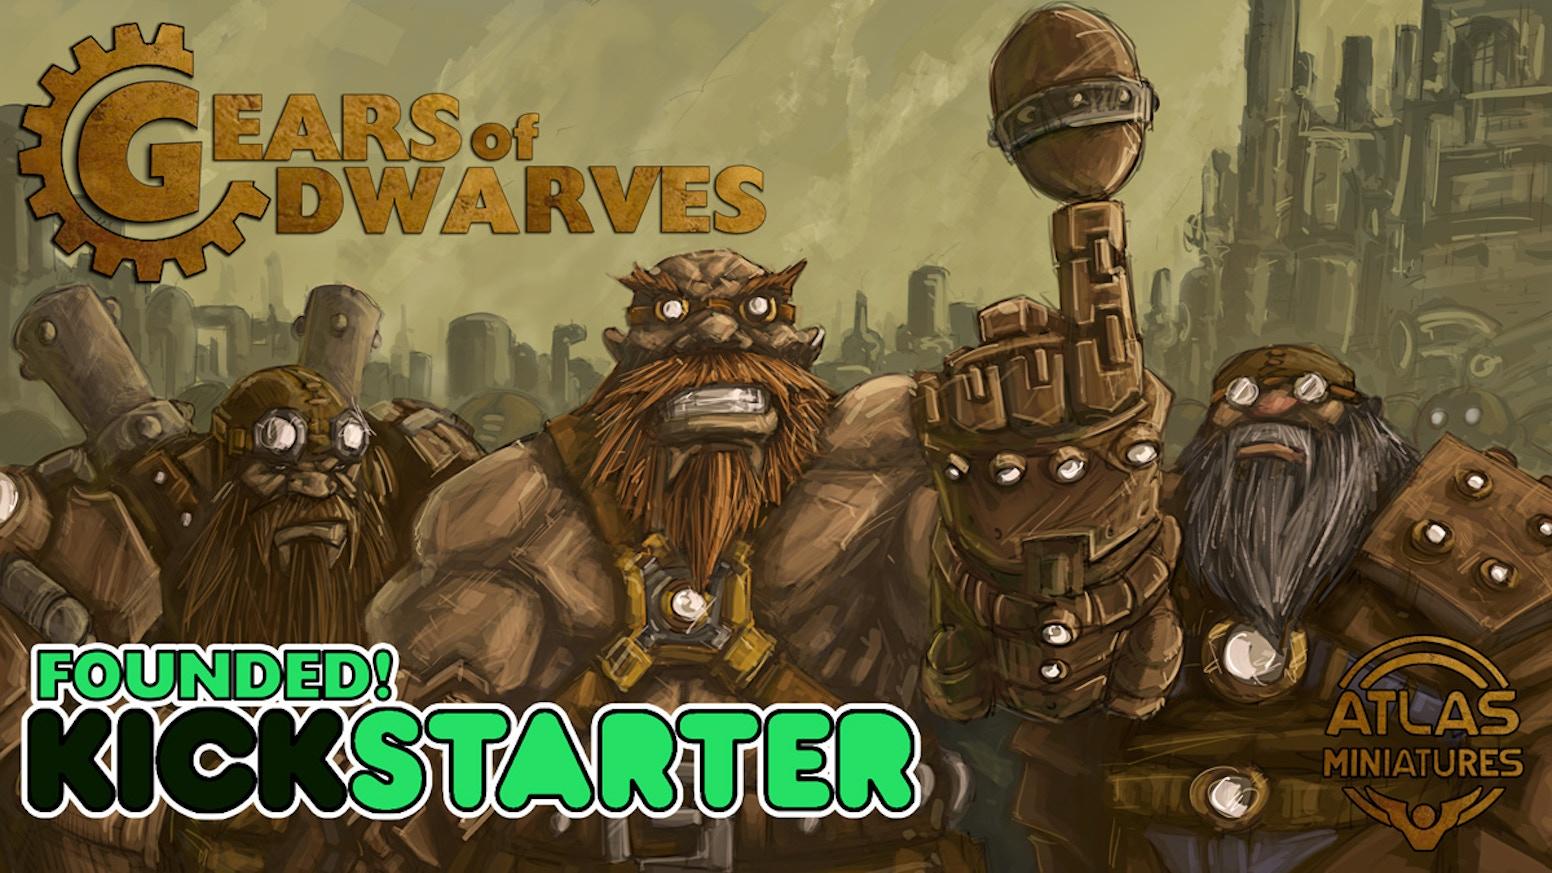 gears of dwarves fantasy football team atlas miniatures by atlas